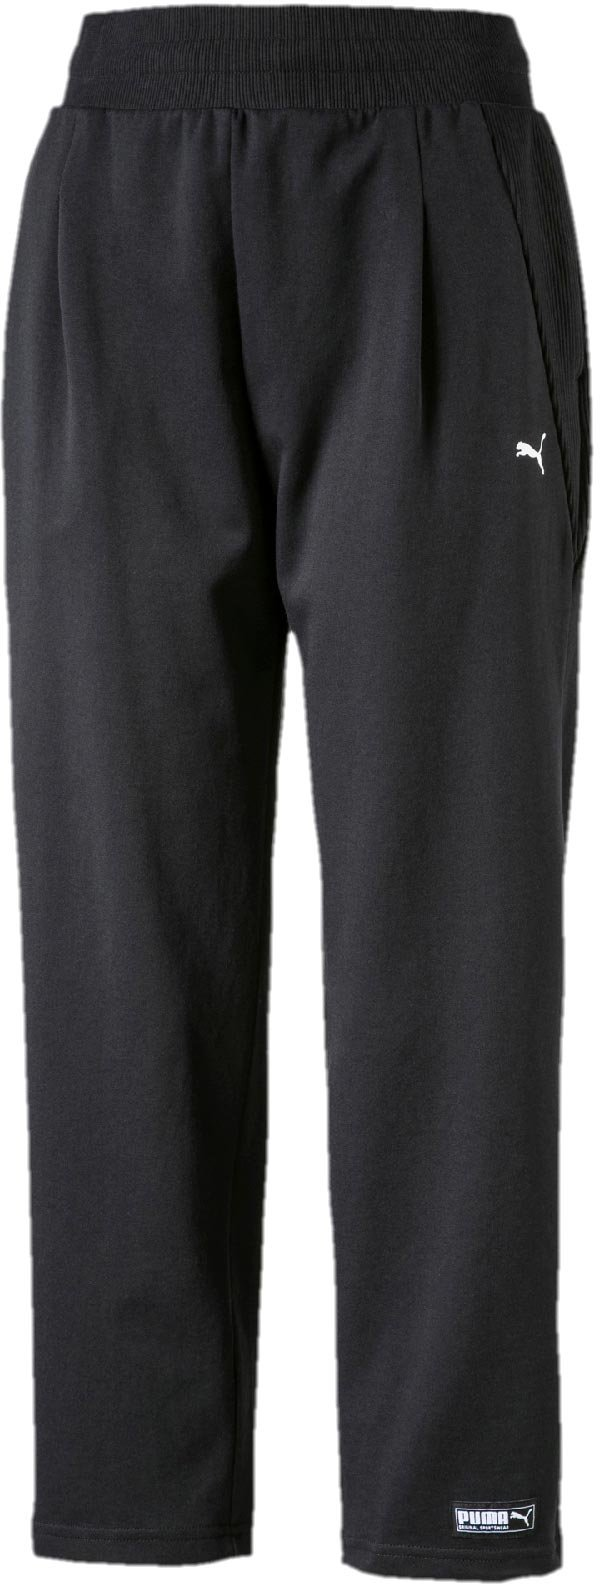 Puma Fusion Pants XS